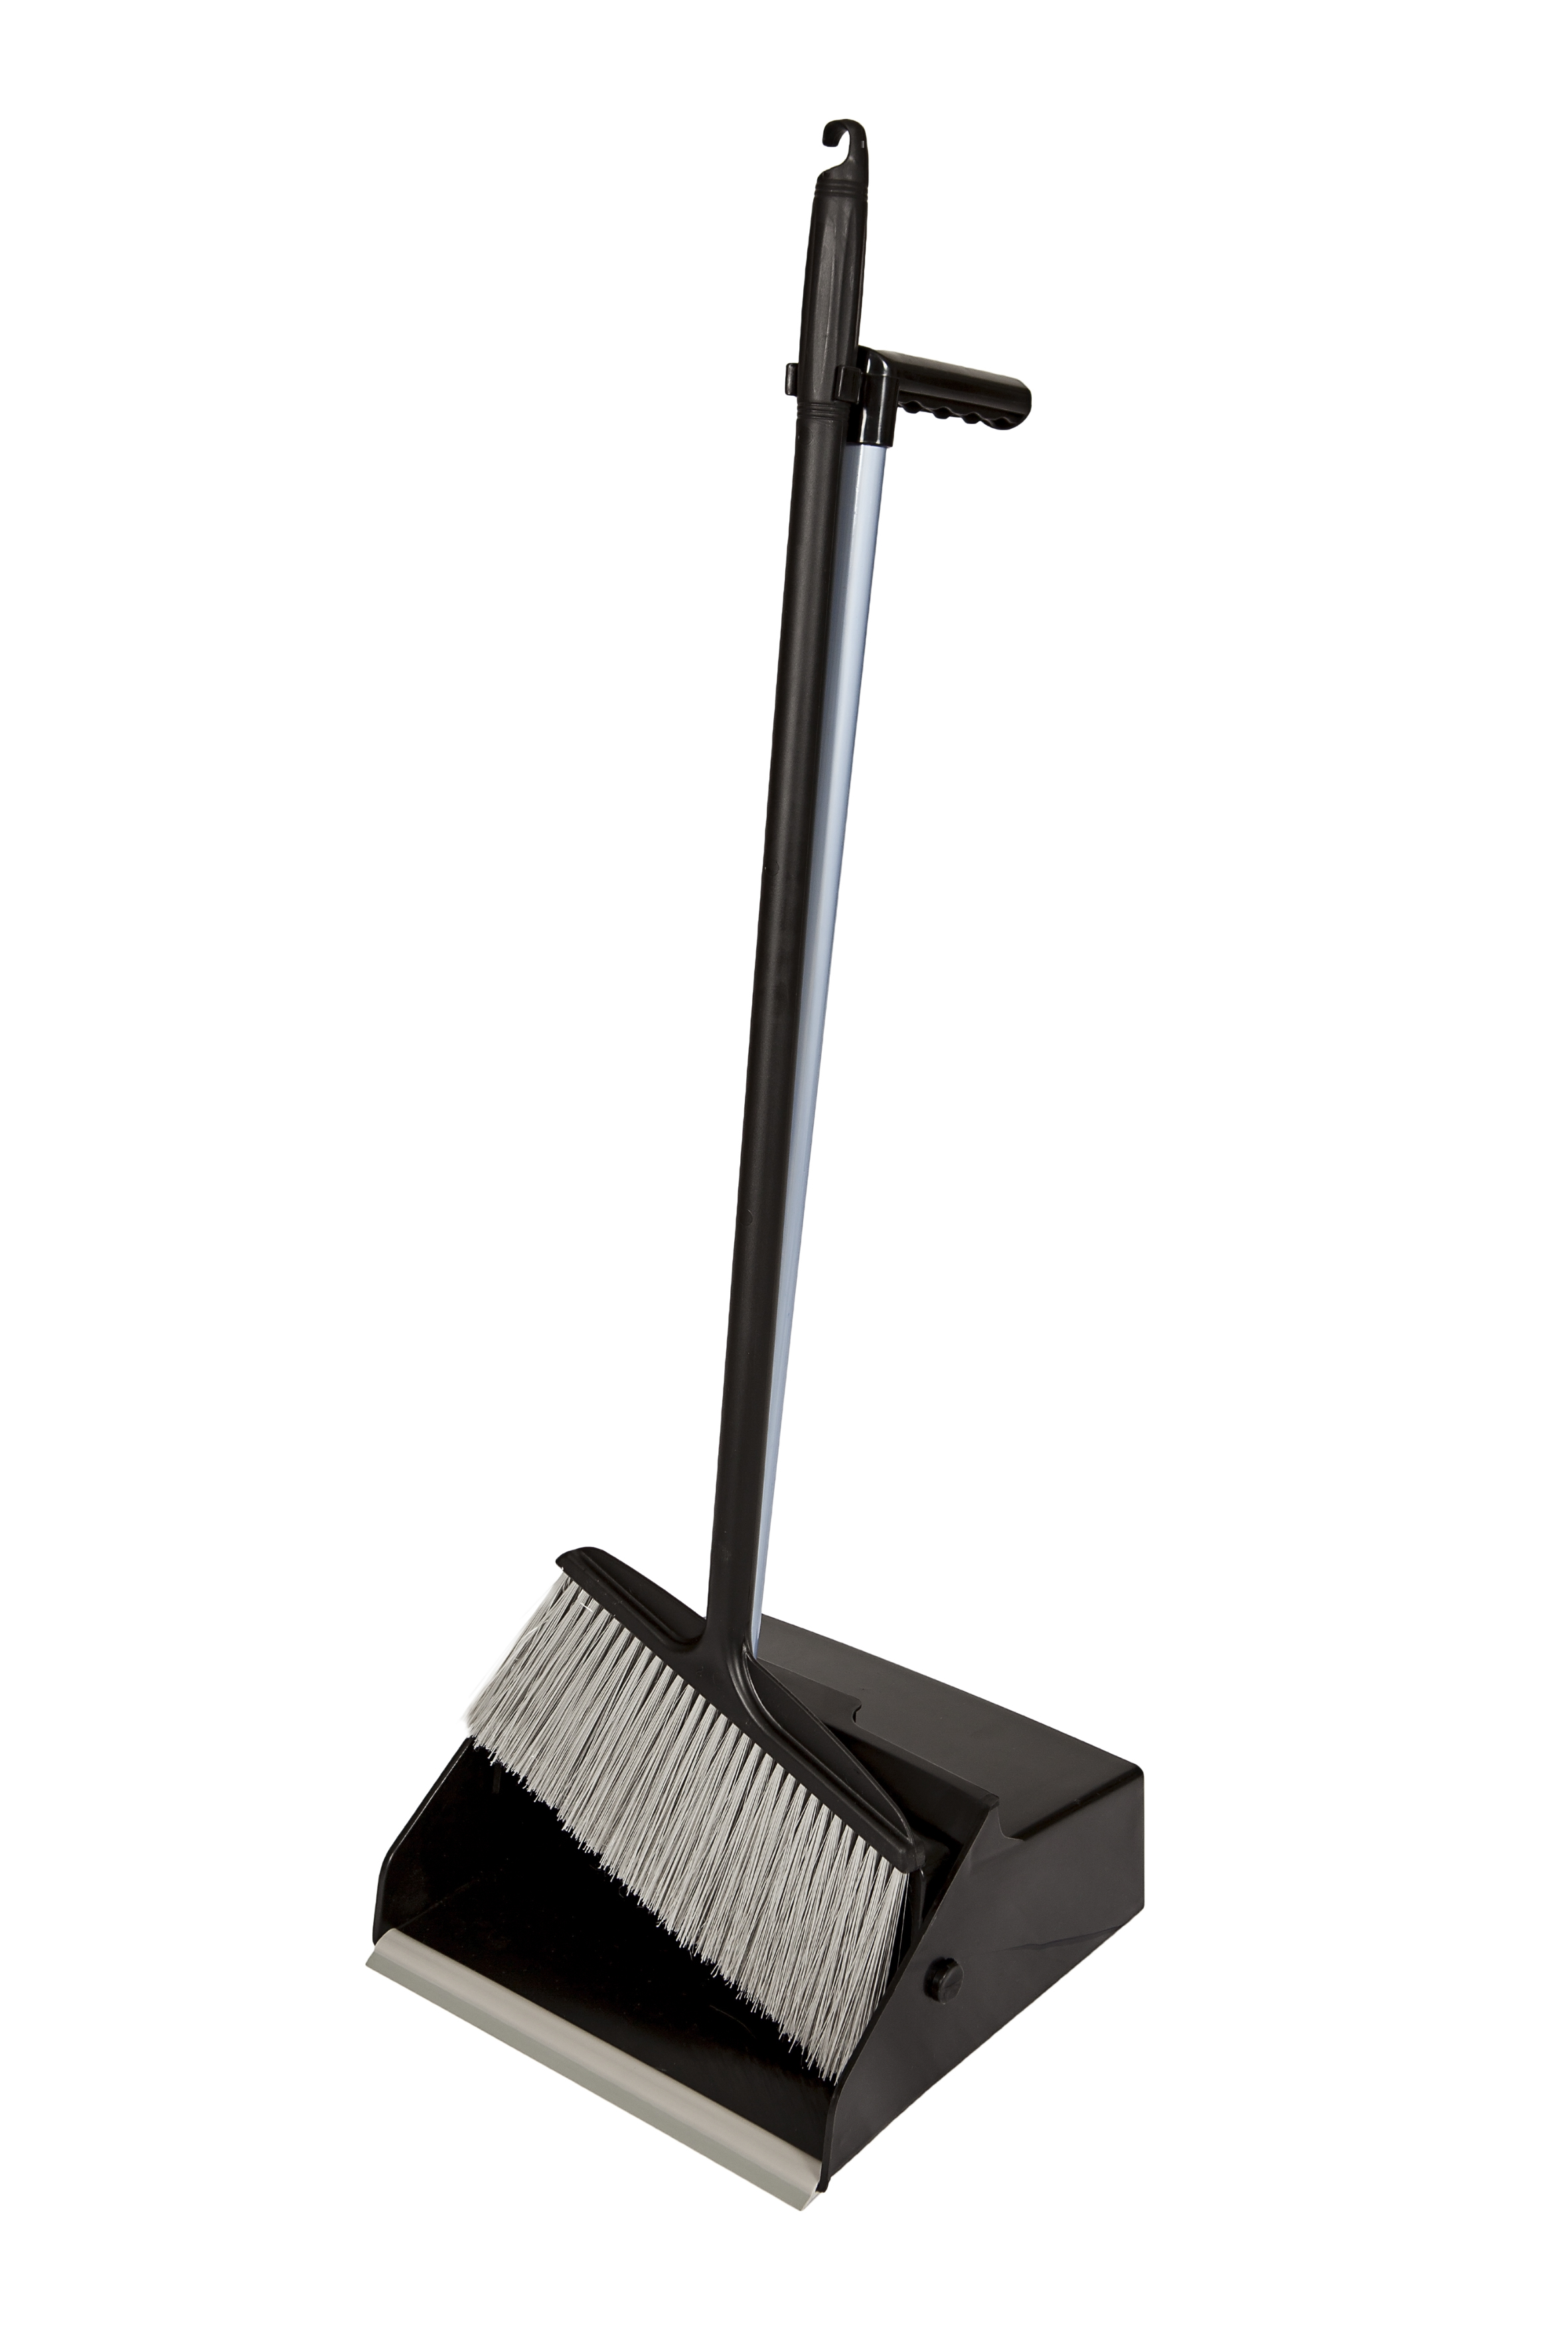 Long Handled Scoop and Broom